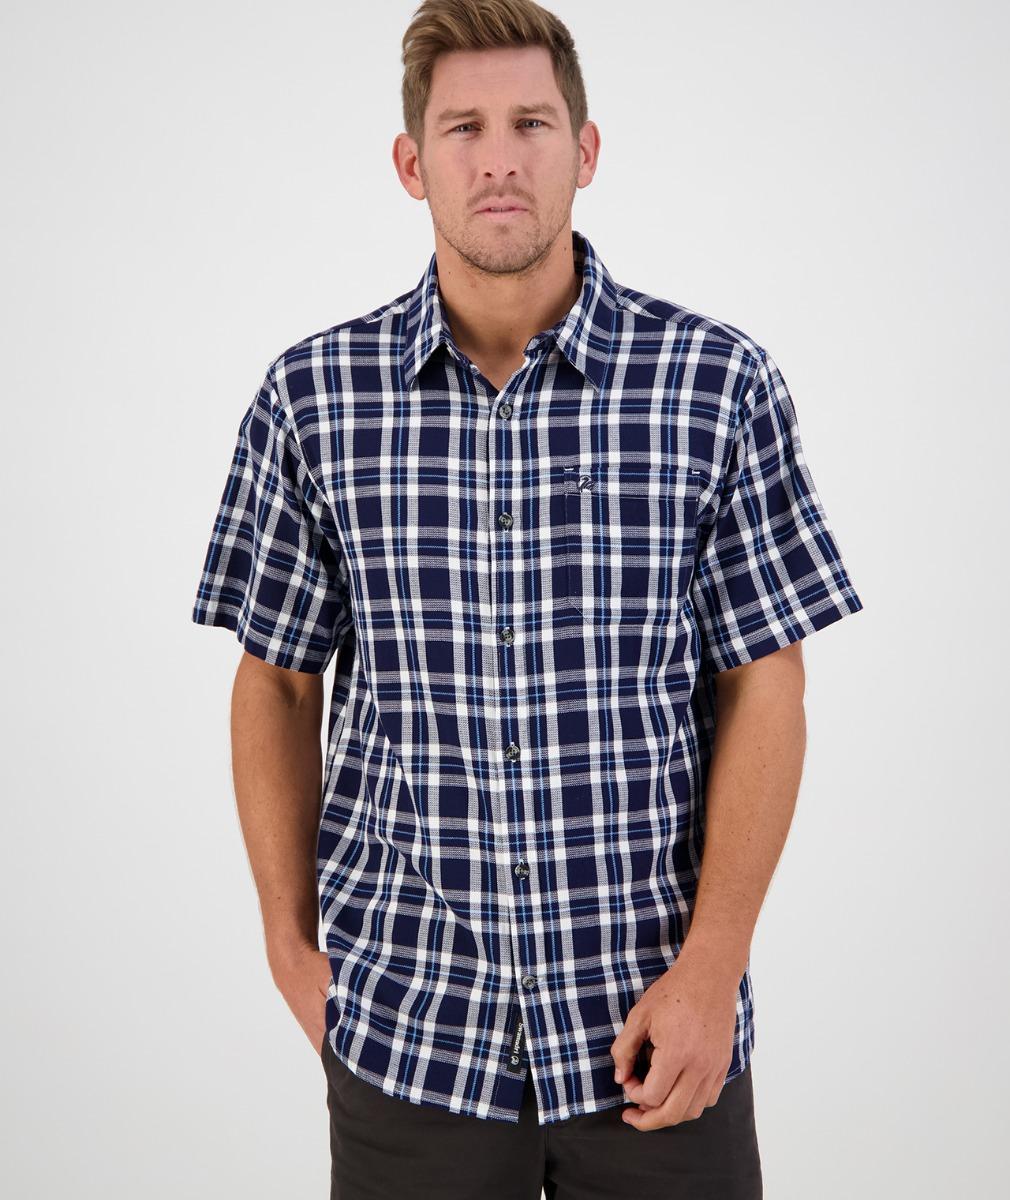 Swanndri Men's Russell Shirt in Dark Navy Grid Check